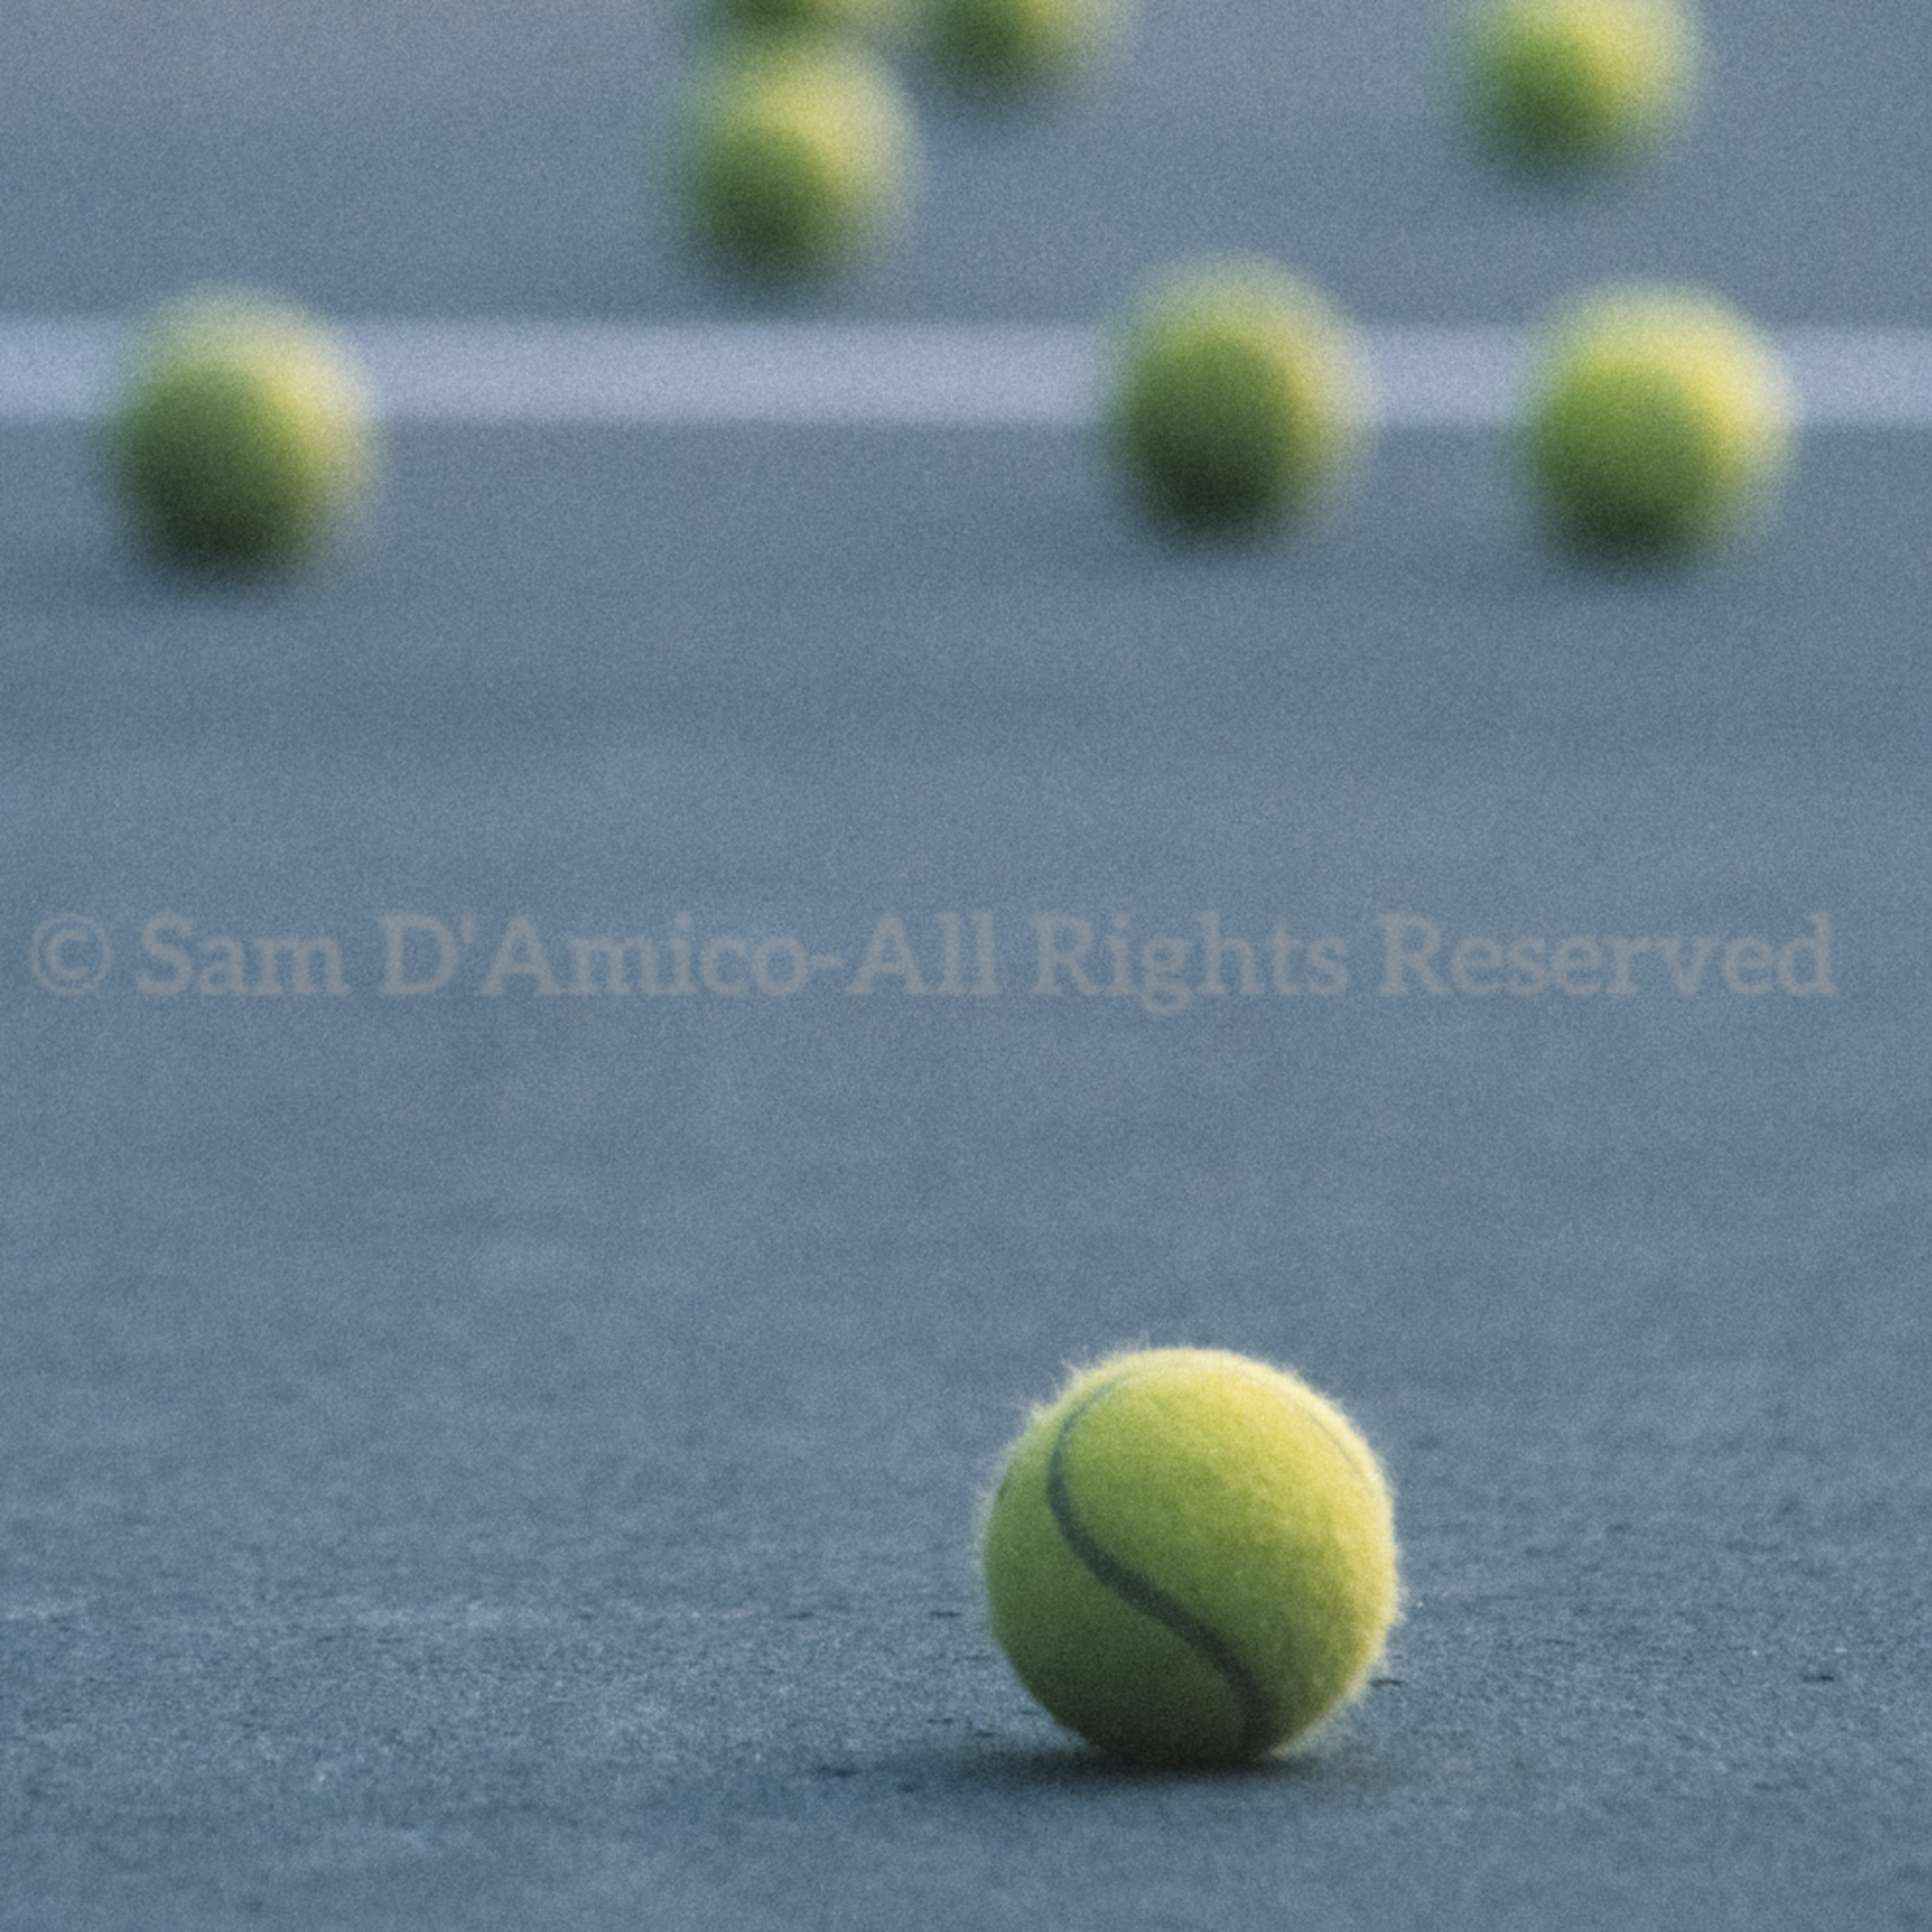 Tennis balls court practice mrqdcp